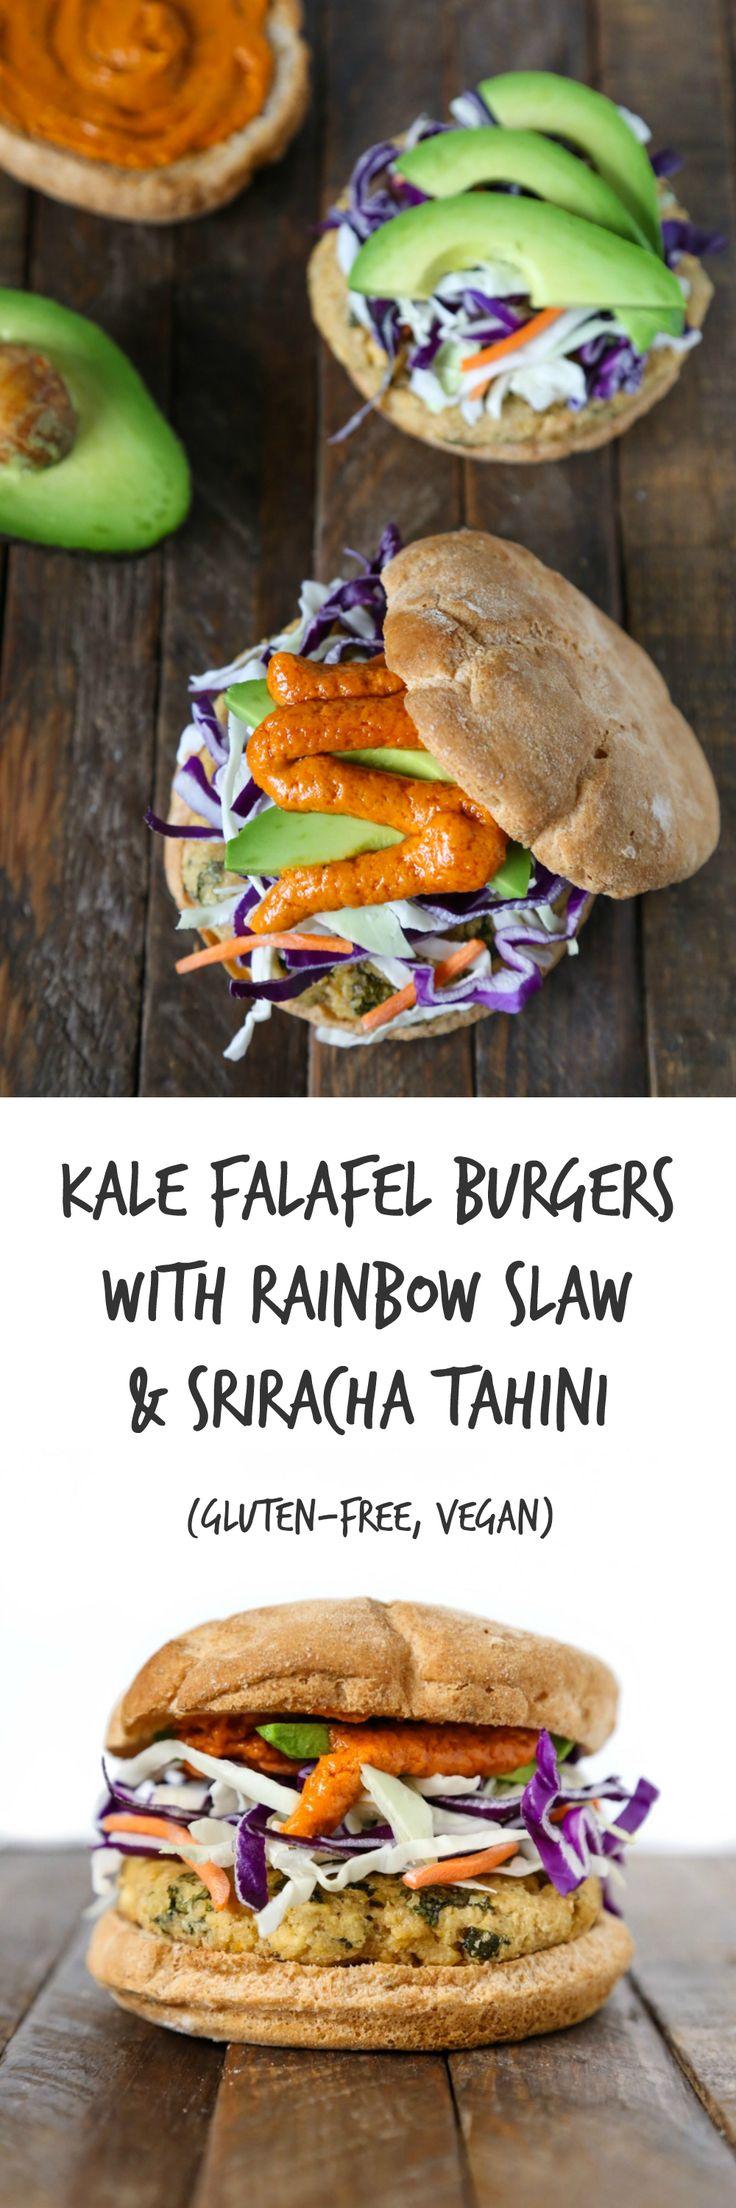 Kale Falafel Burgers with Rainbow Slaw & Sriracha Tahini | Gluten-free…